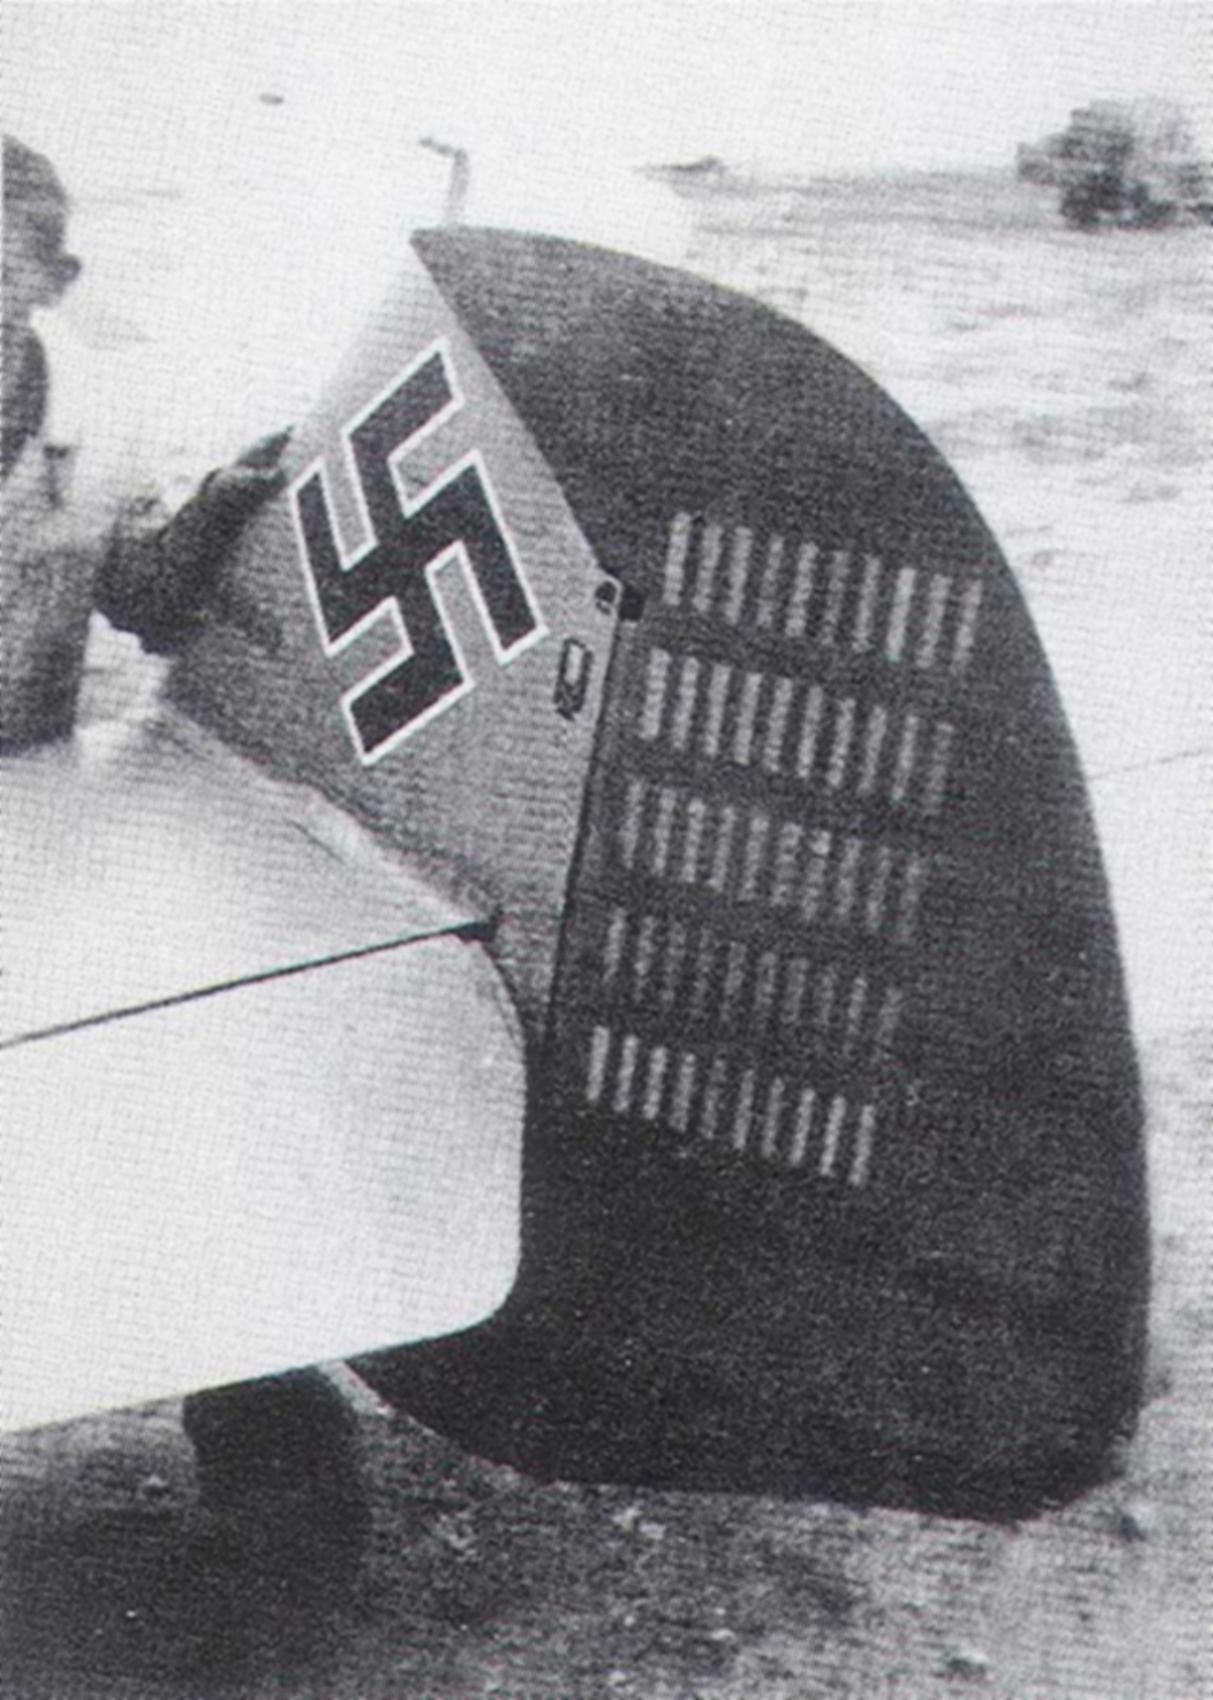 Messerschmitt Bf 109F4Trop 3.JG27 Yellow 14 Hans Joachim Marseille WNr 8693 Martuba Feb 1942 05